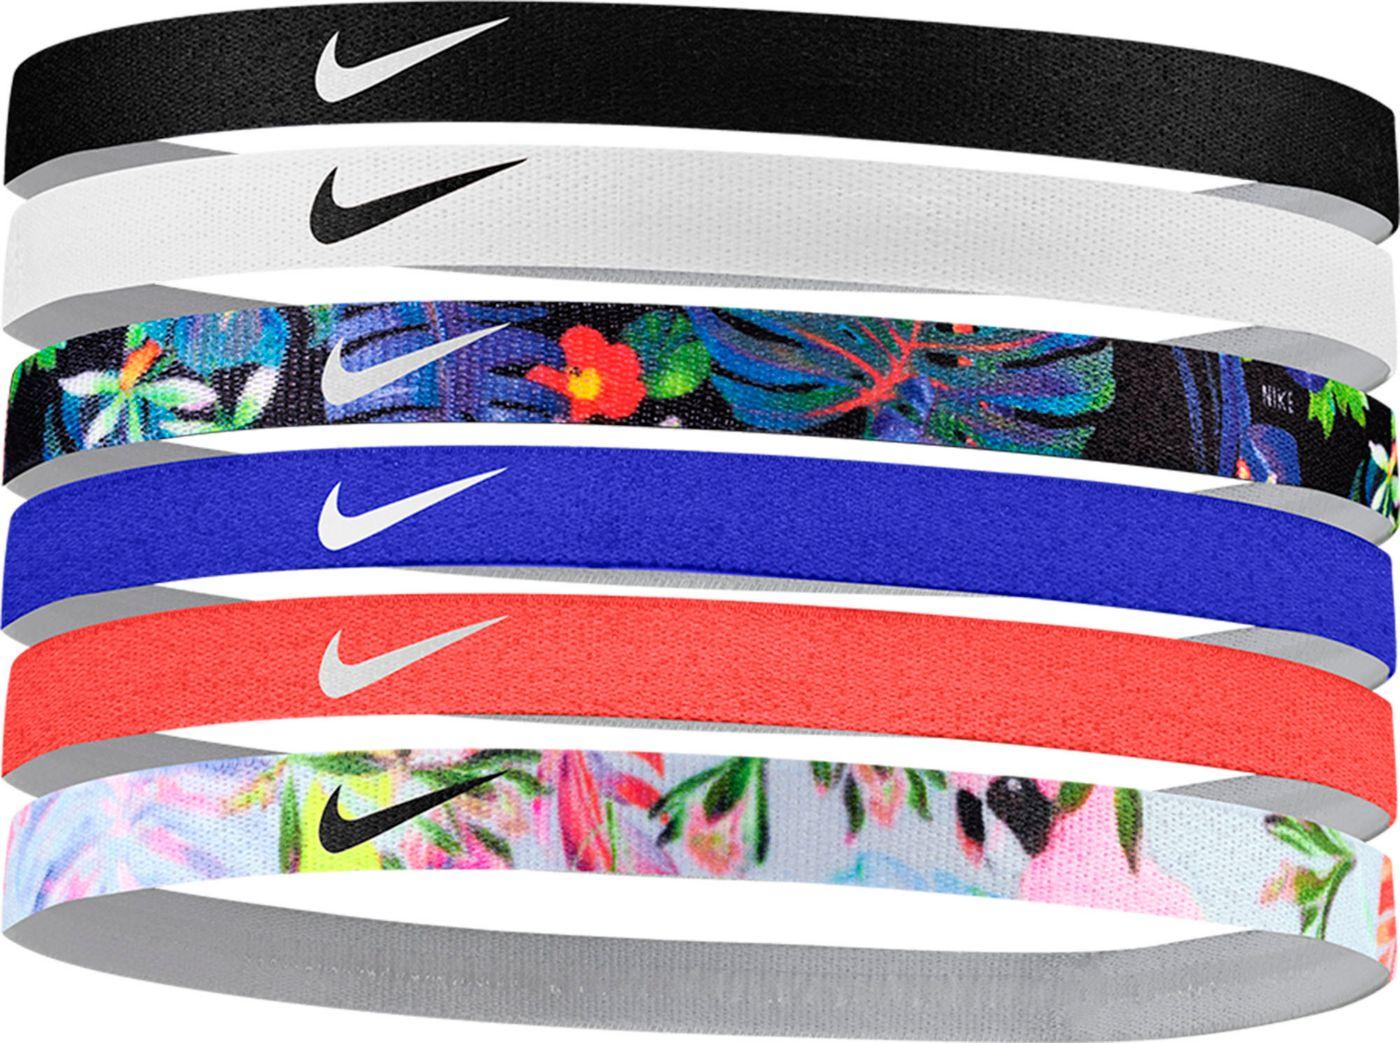 Nike Women's Printed Assorted Headbands – 6 Pack